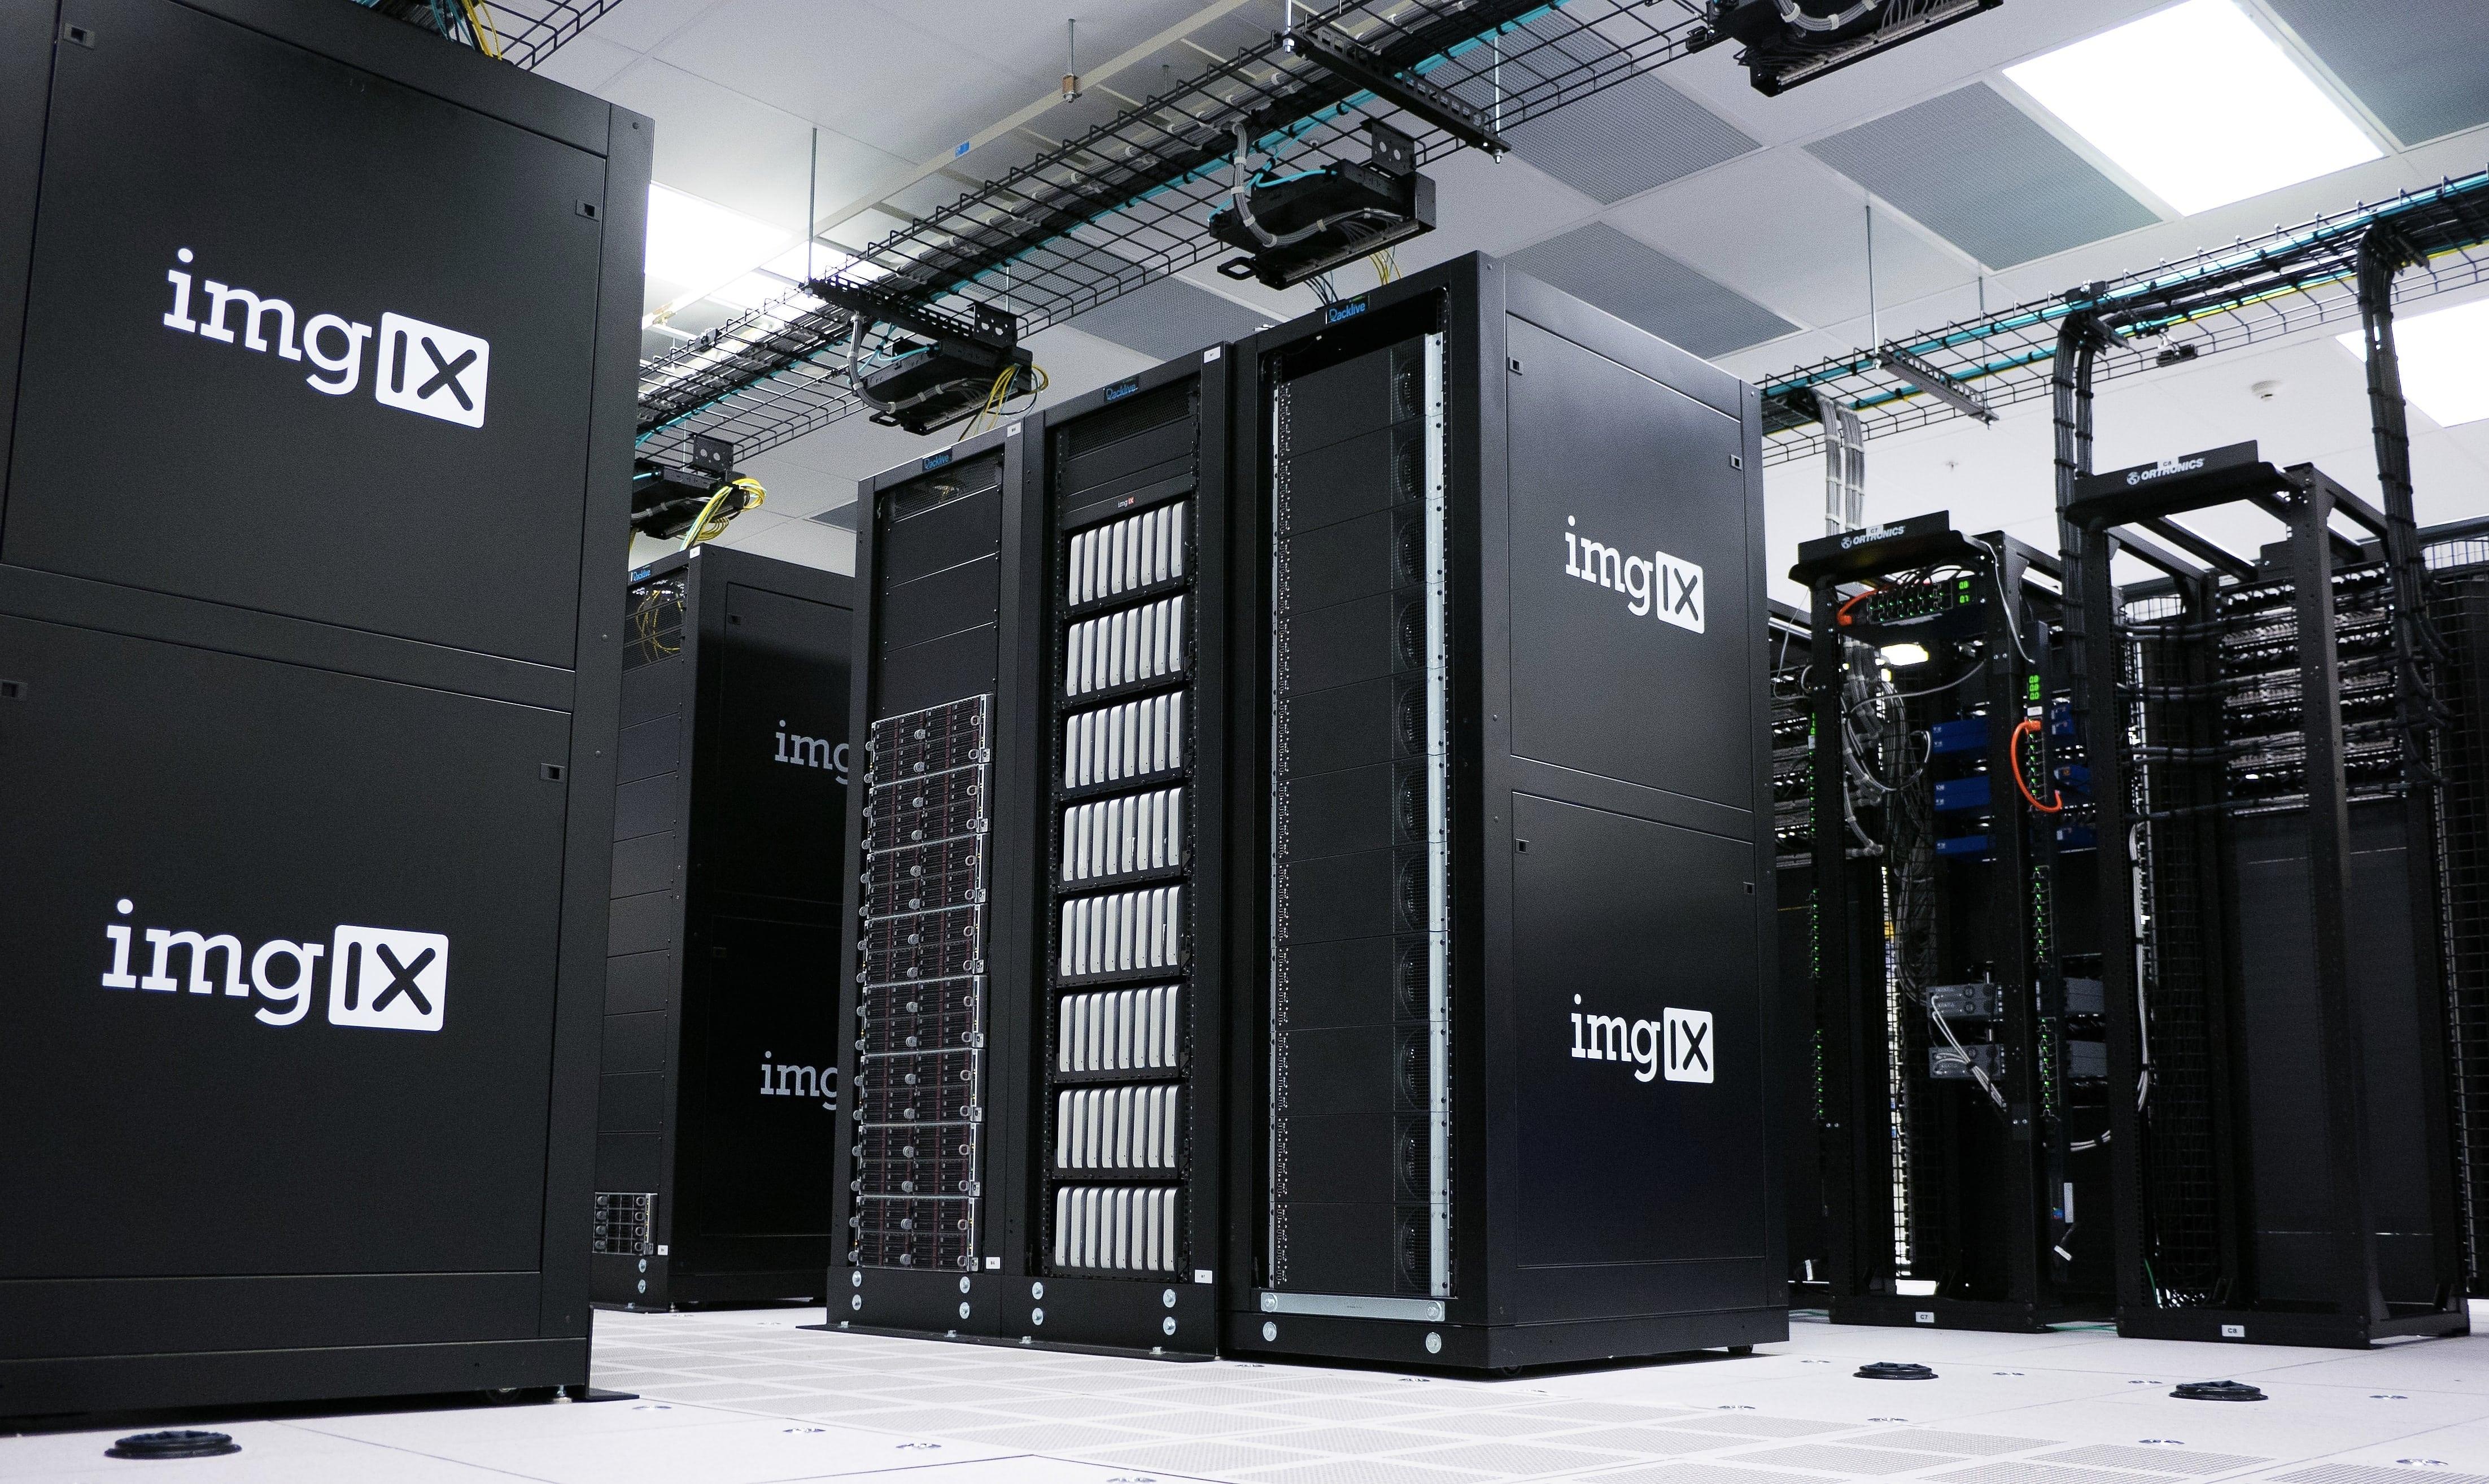 colocation data center stacks or servers